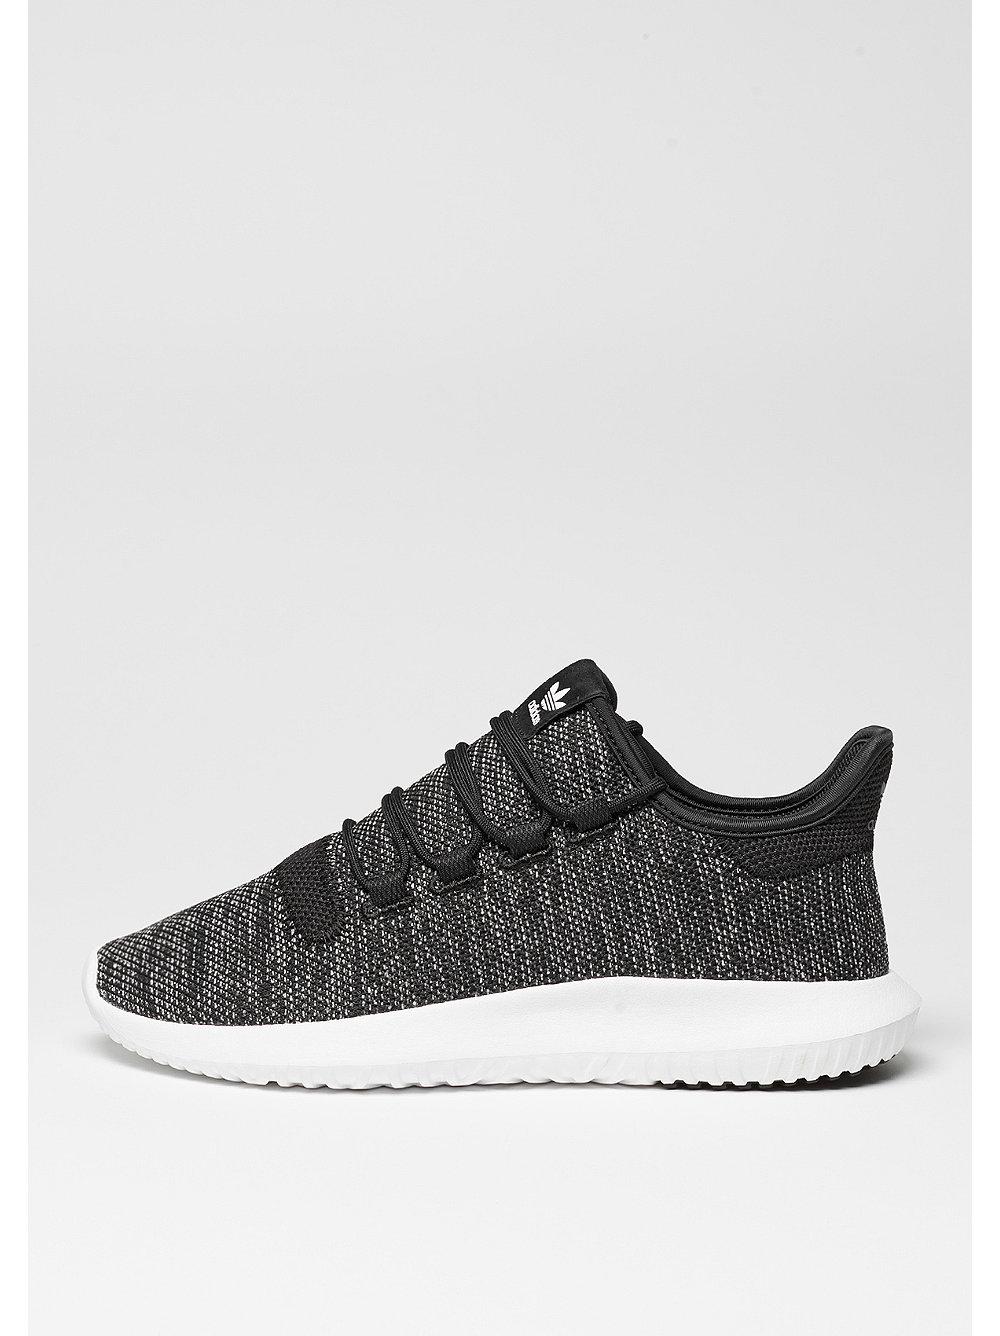 adidas Tubular Shadow 3D Knit core black-utility black